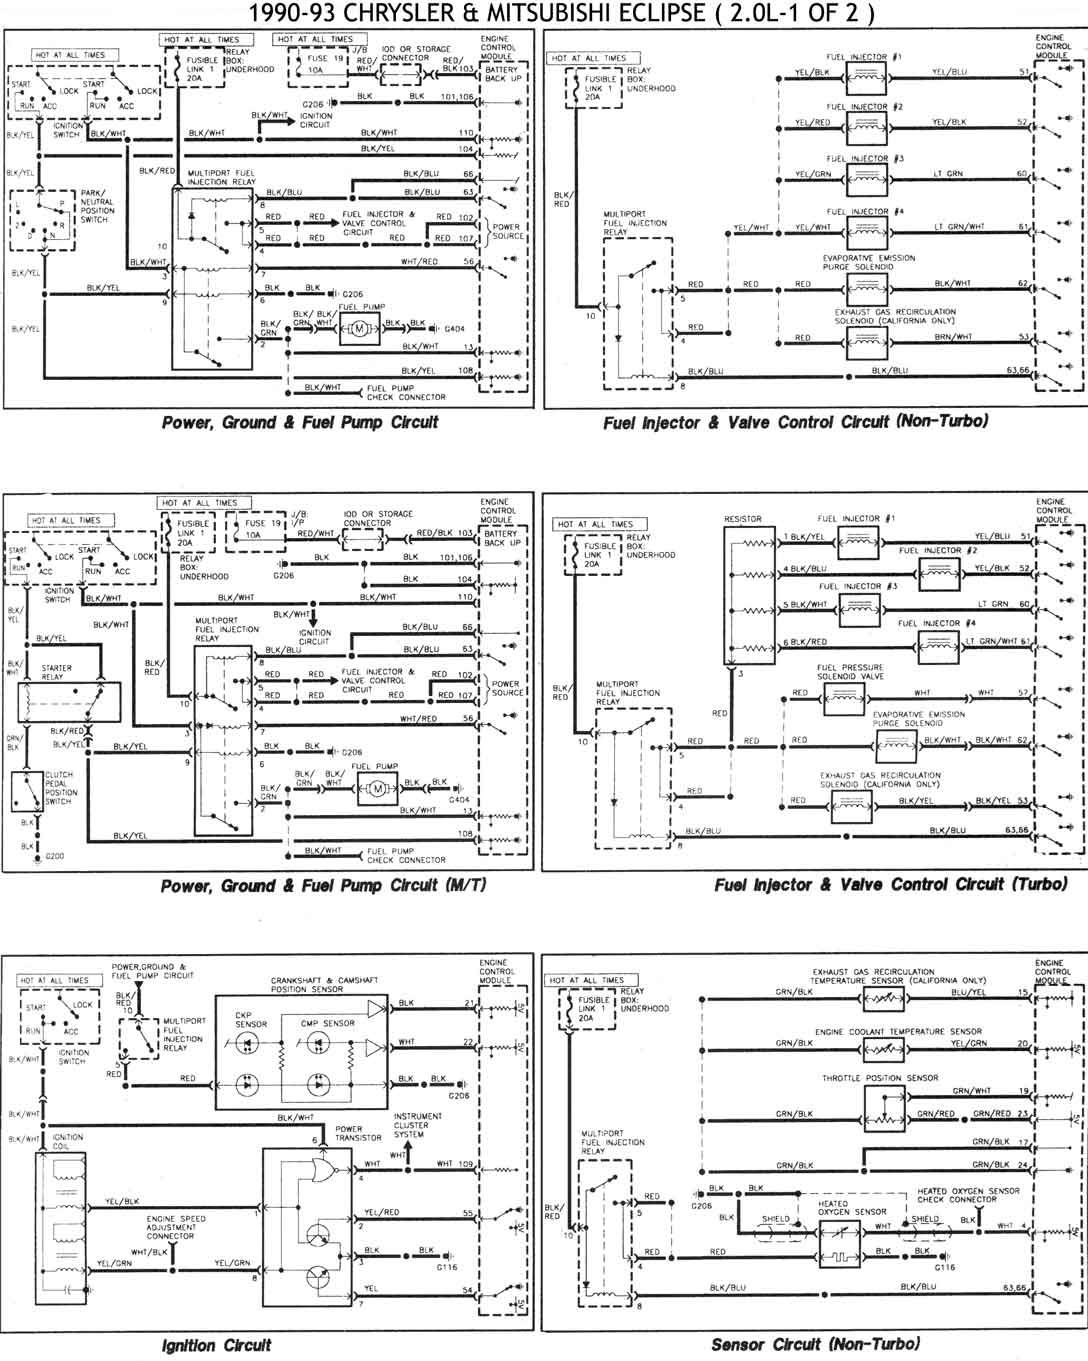 diagramas electricos stratus 98